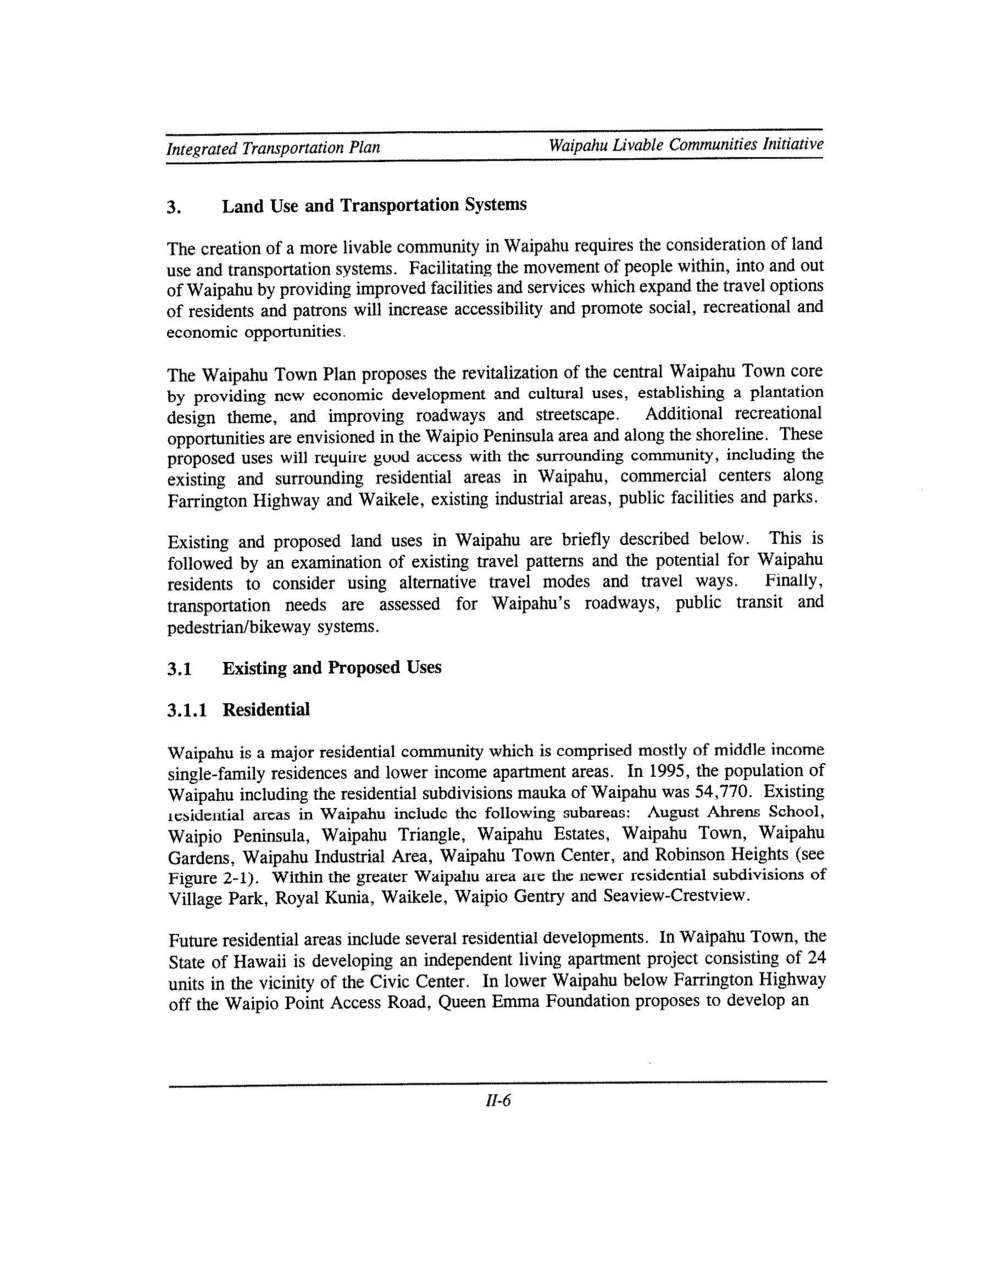 160531_WaipahuLivableCommunities(1998)_Page_021.jpg